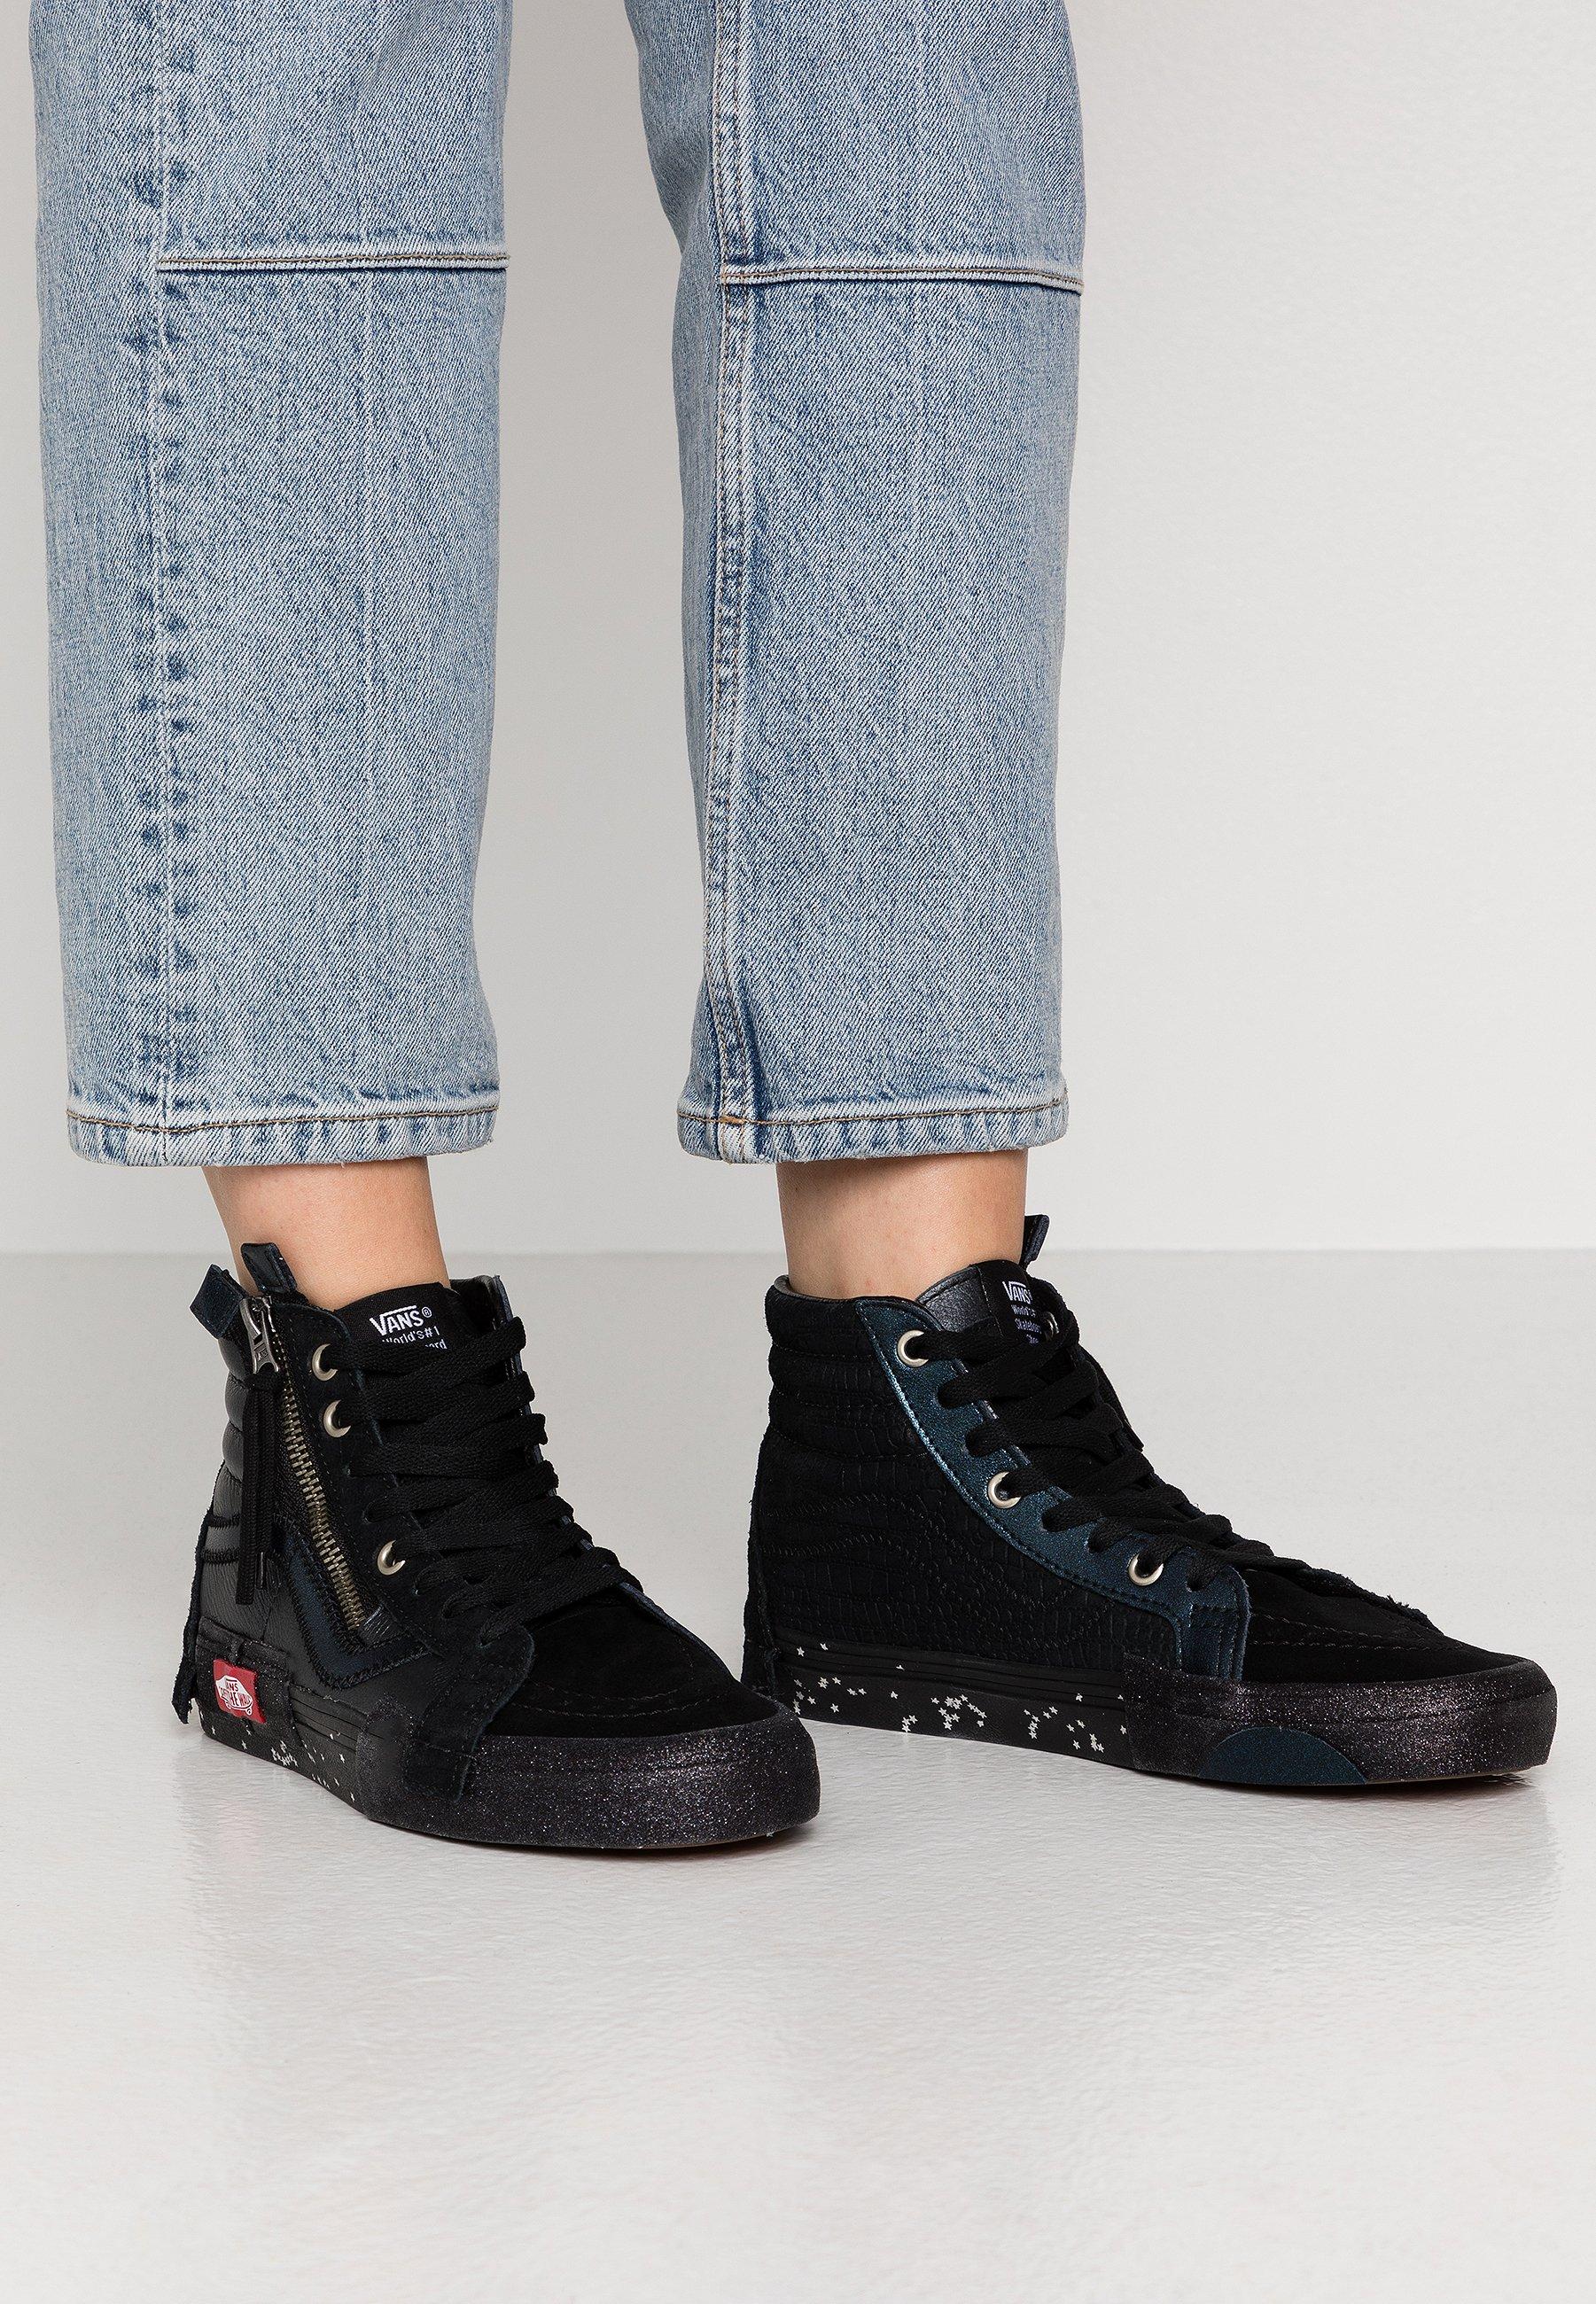 Vans SK8 HI Sneaker high black